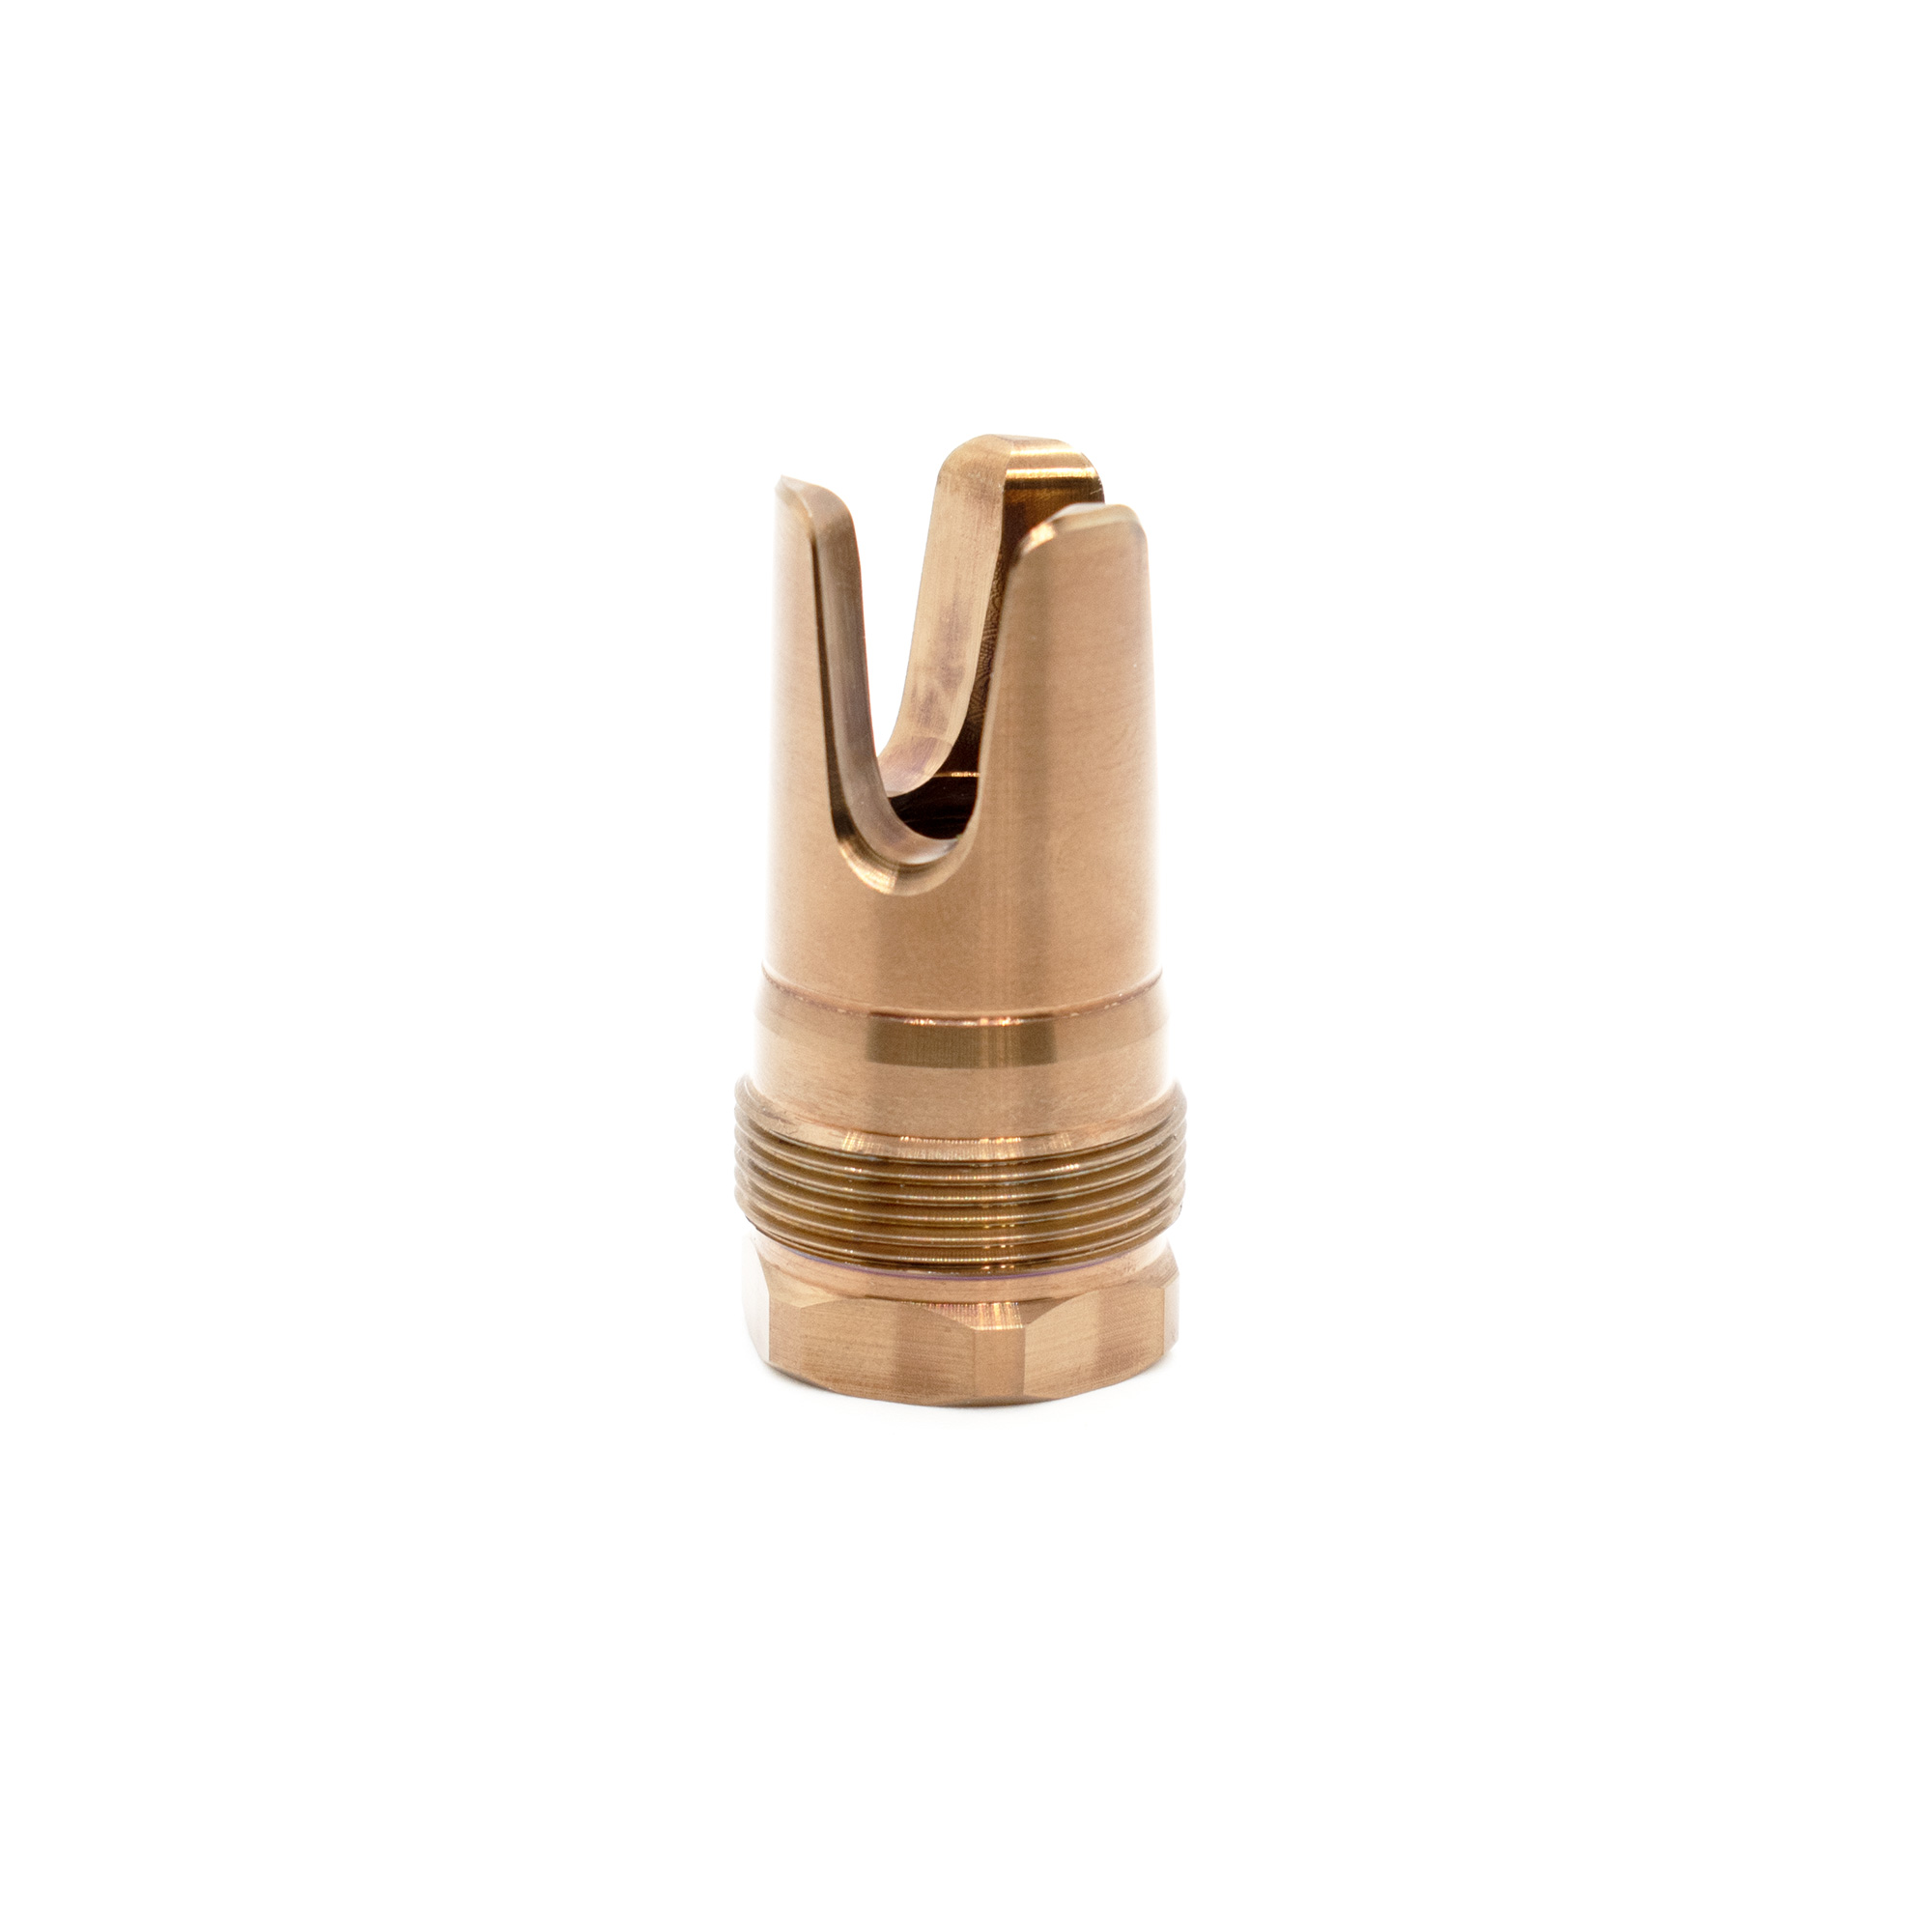 rearden mfg fhd 3 prong flash hider q plant b mount suppressor mounts